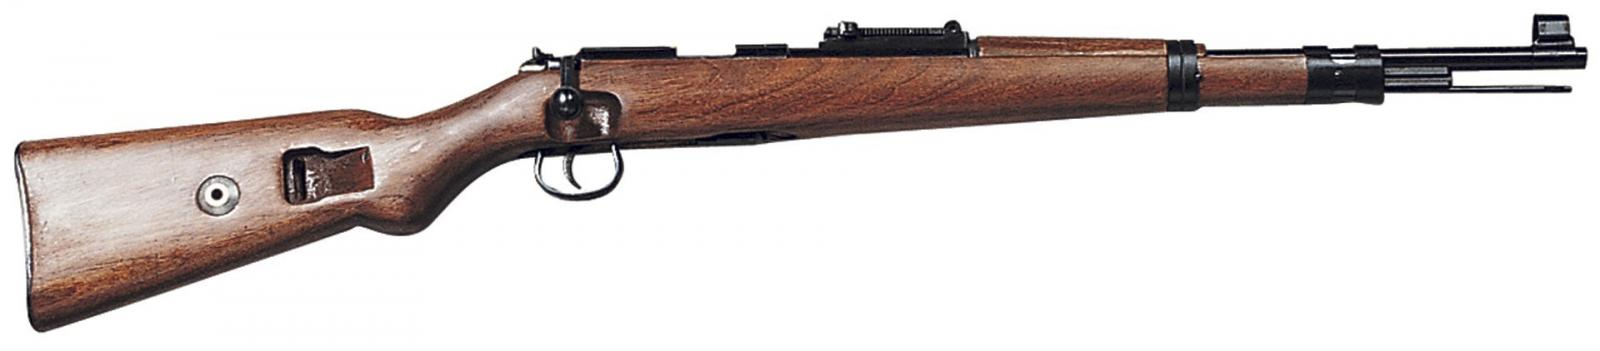 Carabine NORINCO JW25A COURTE (TU33/40)